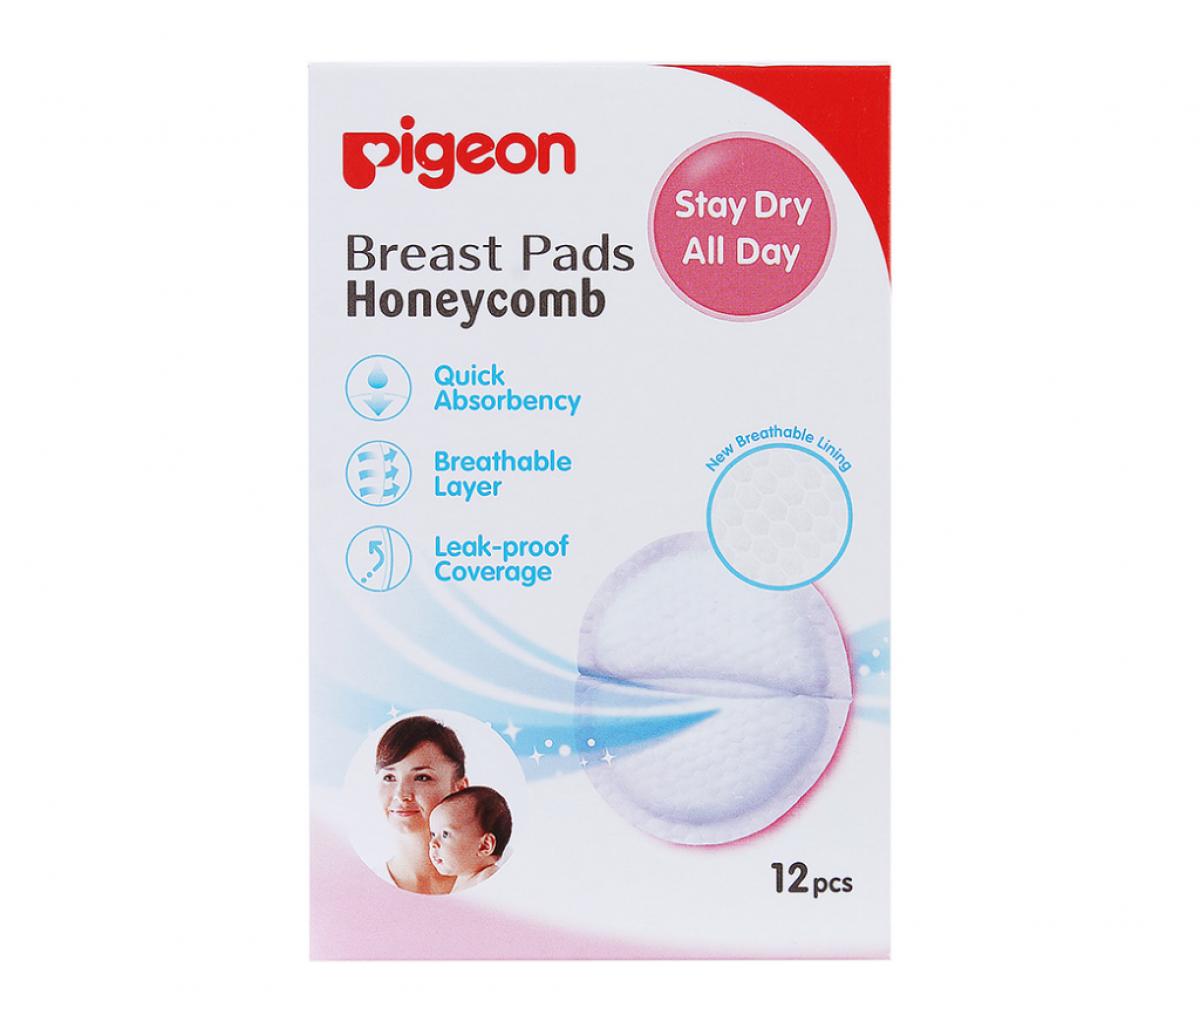 Breast Pads Honeycomb (12pcs) Box, English  [16583]